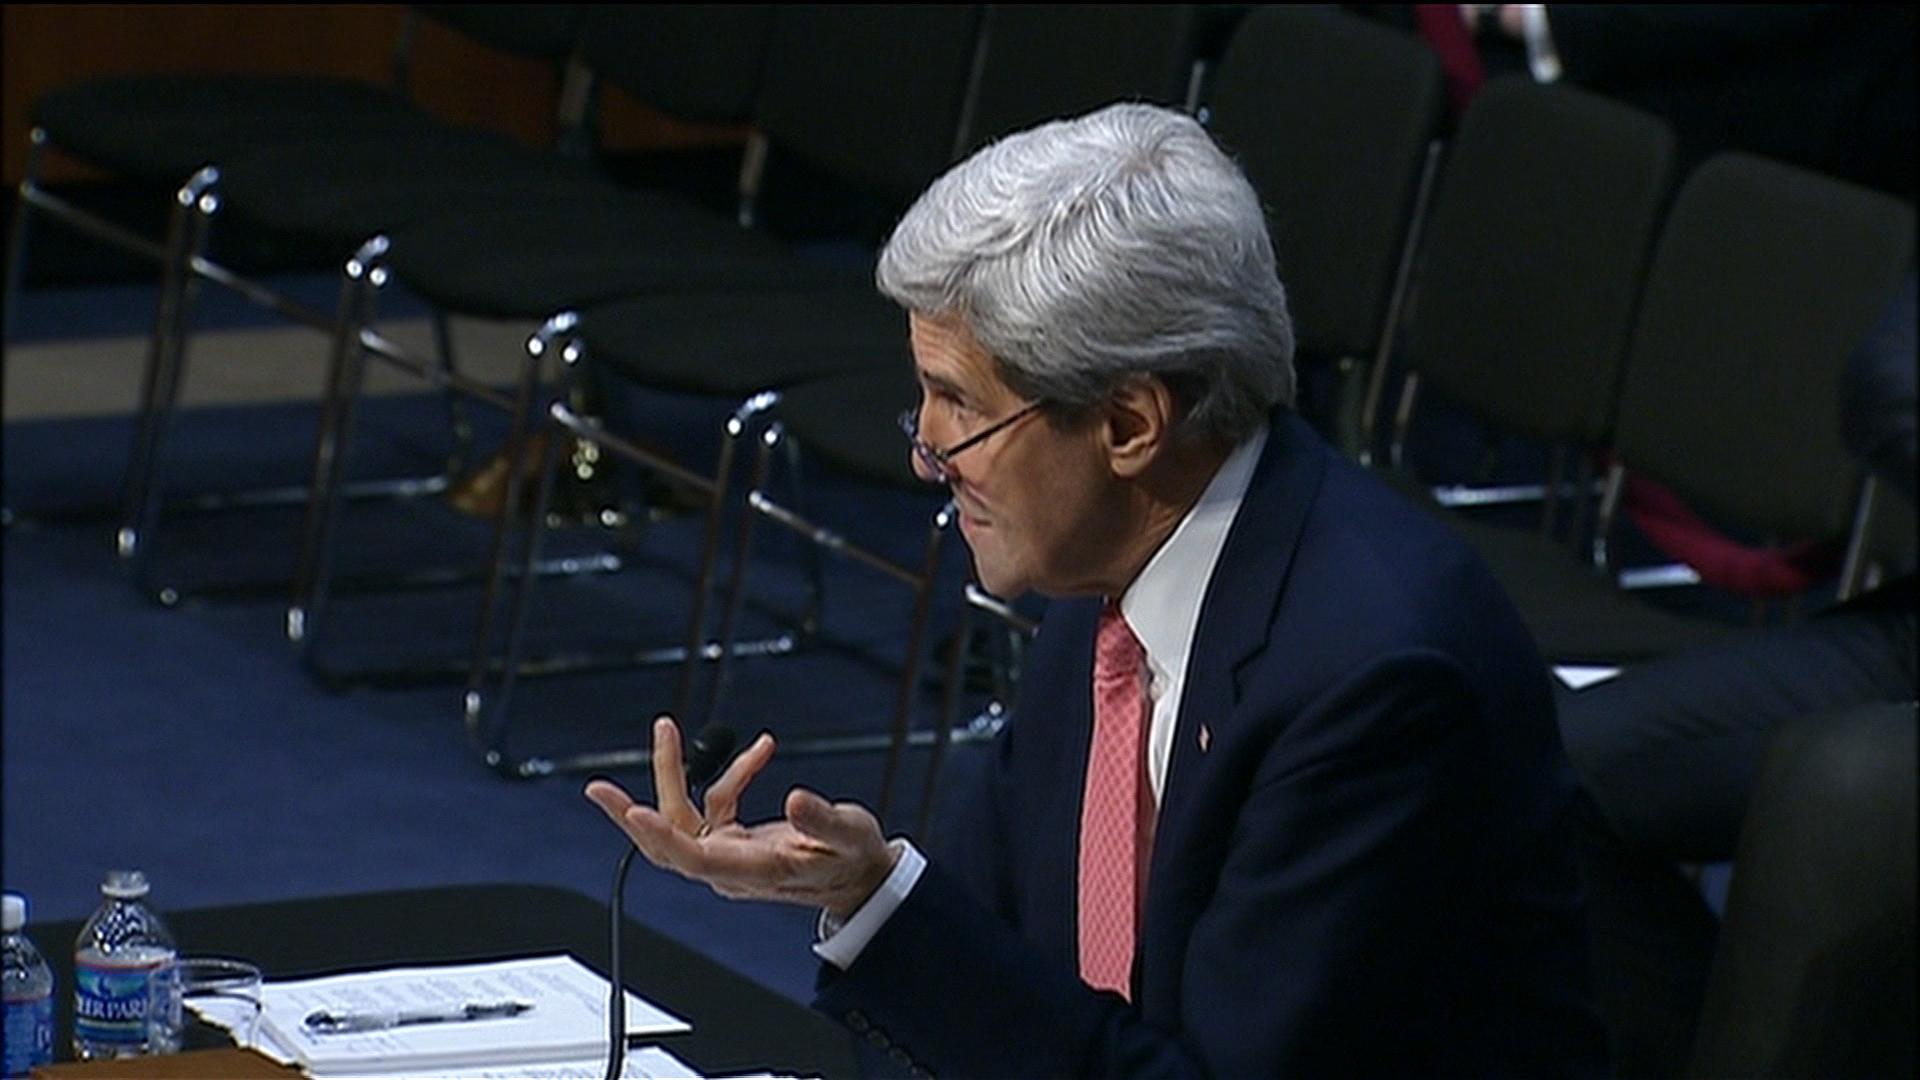 Kerry's 'apartheid state' remark stokes ire